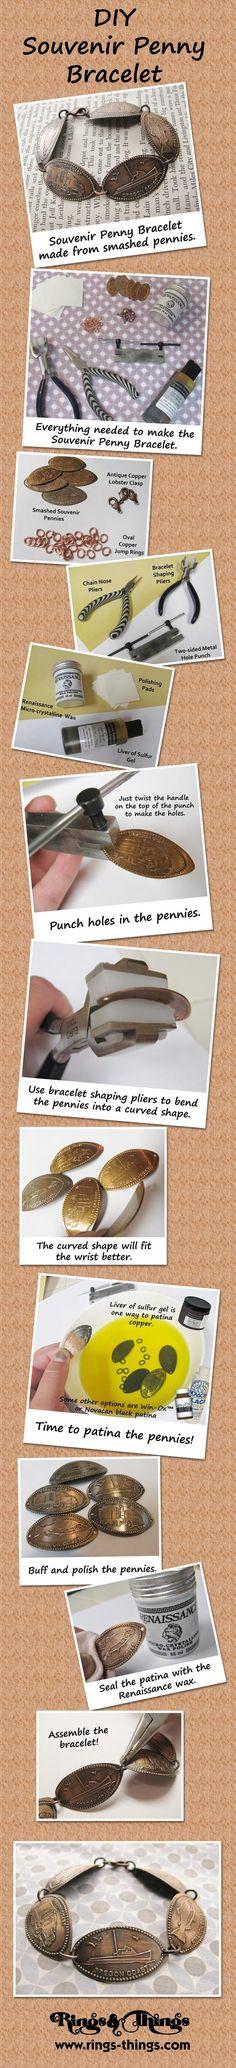 DIY Souvenir Penny Bracelet.  A tutorial from Rings & Things.